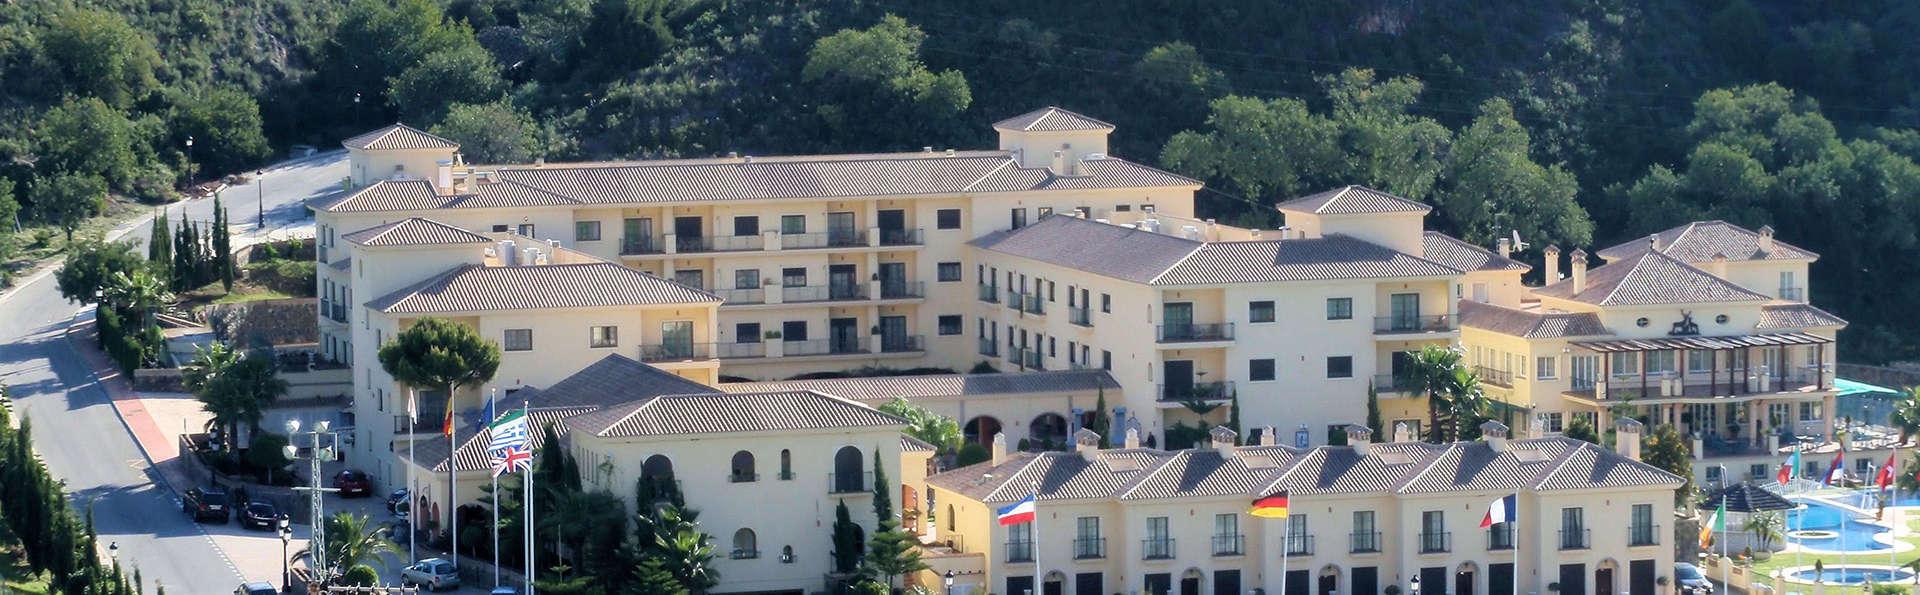 Gran Hotel Benahavís - edit_total.jpg